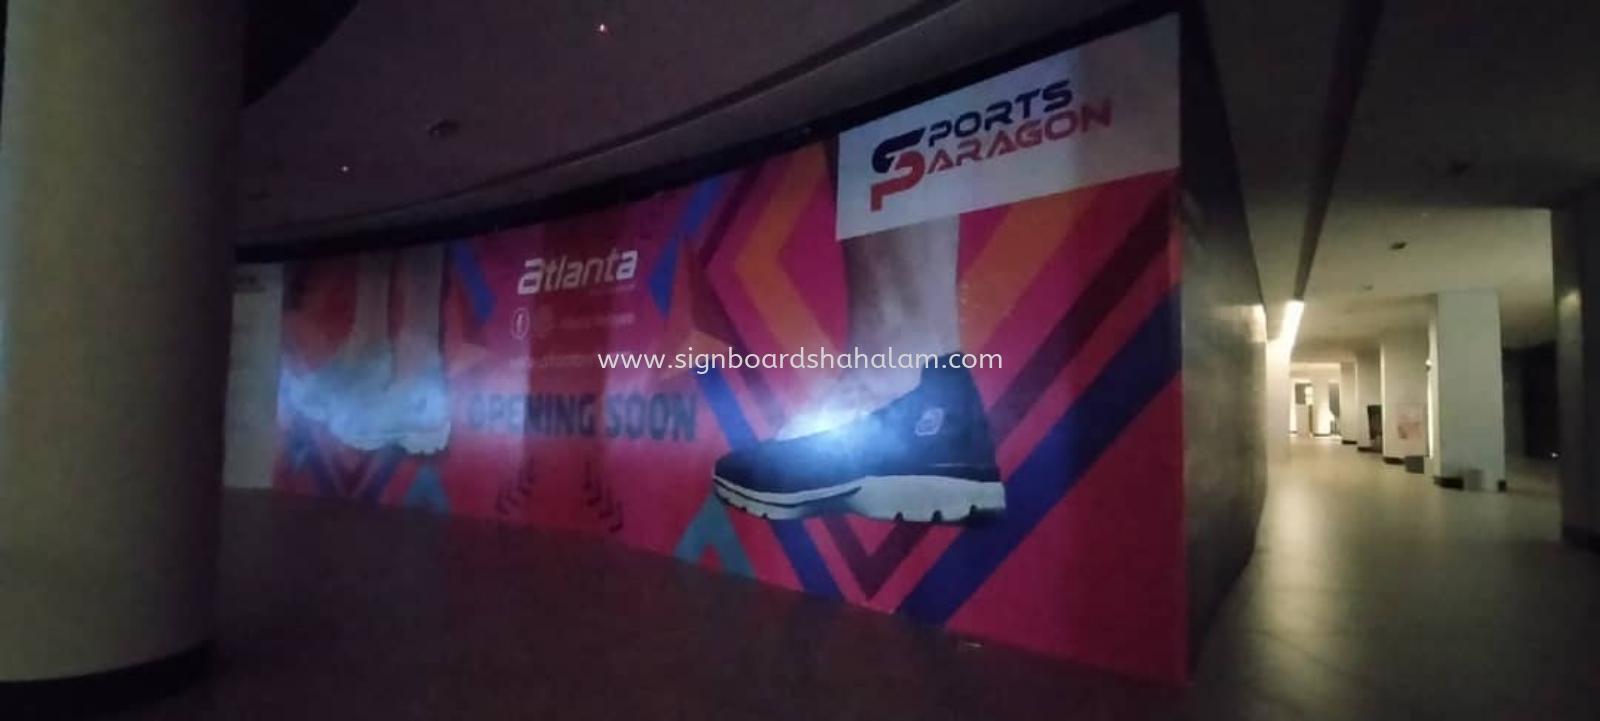 Paragon Vest Petaling Jaya - Hording Board Indoor